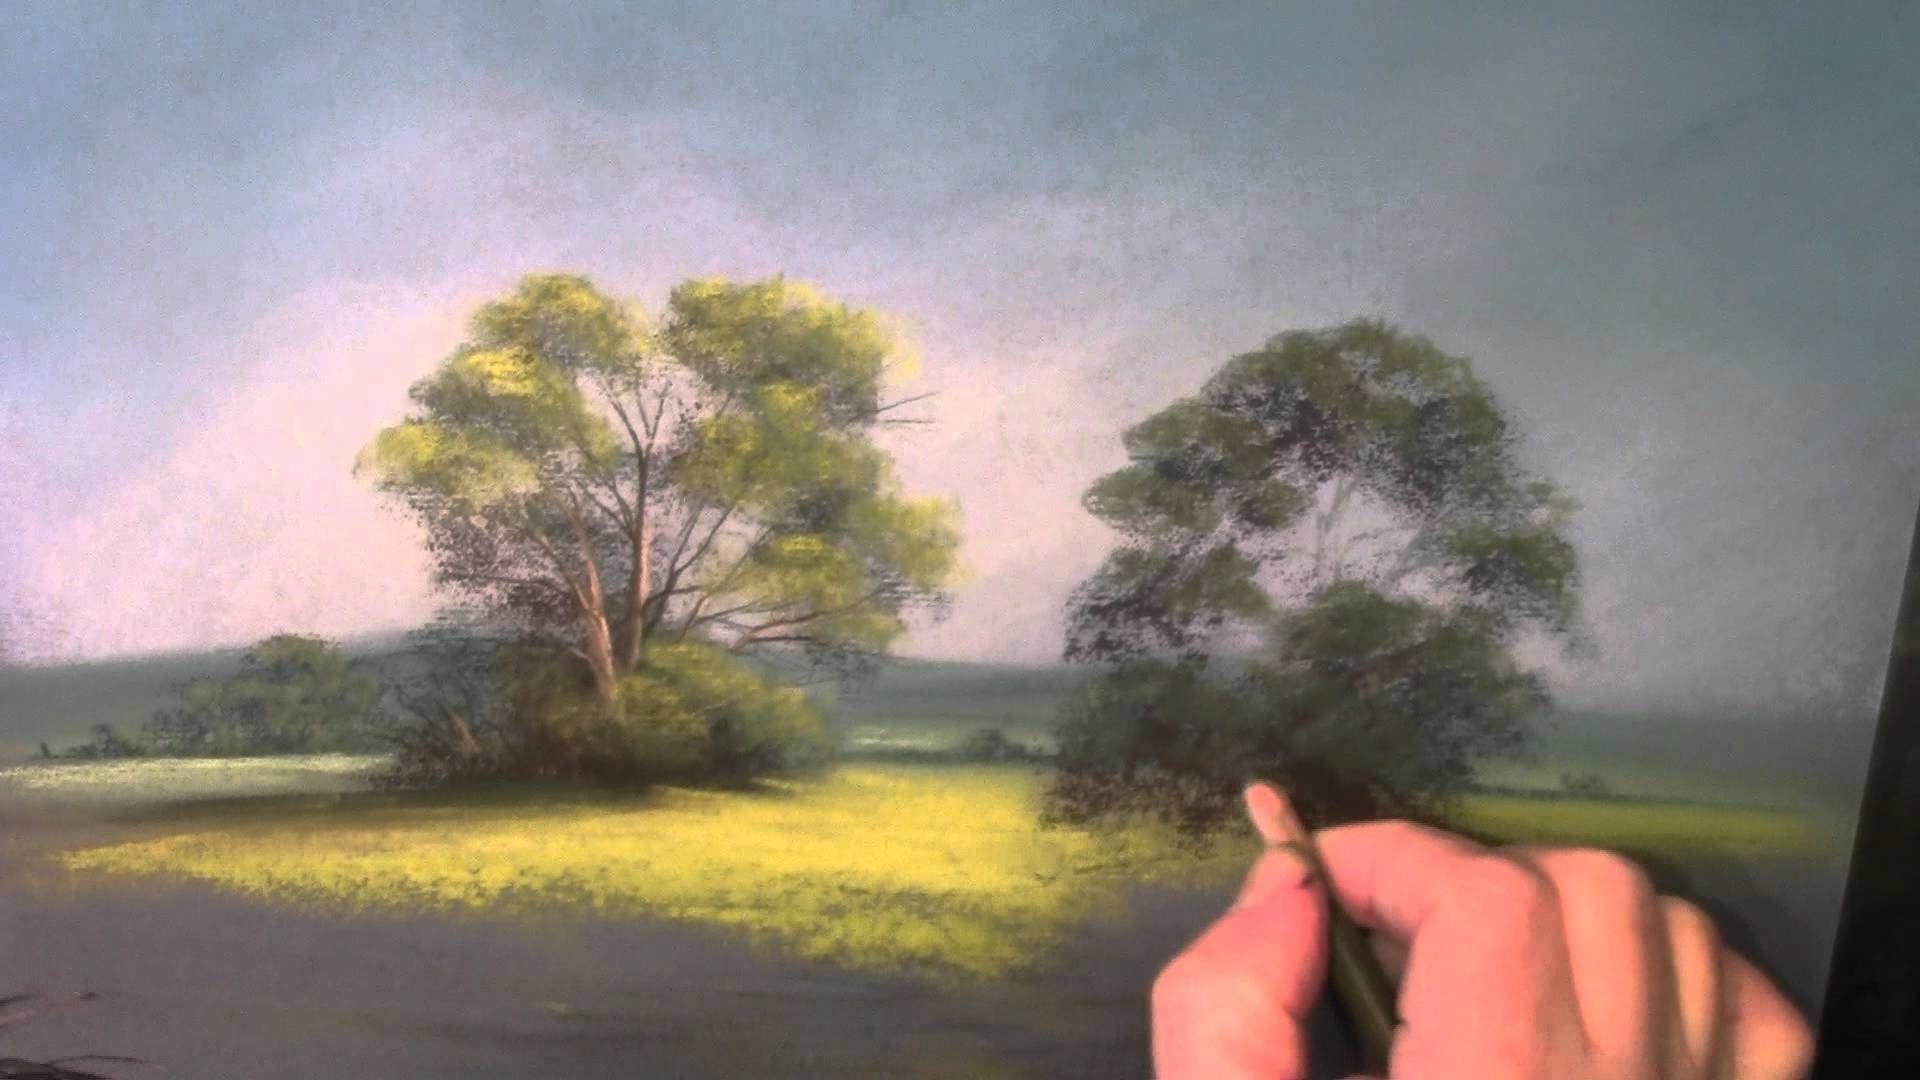 Moody Views Trees In Pastel Youtube Pastell Kreide Pastell Malerei Pastellkreide Kunst